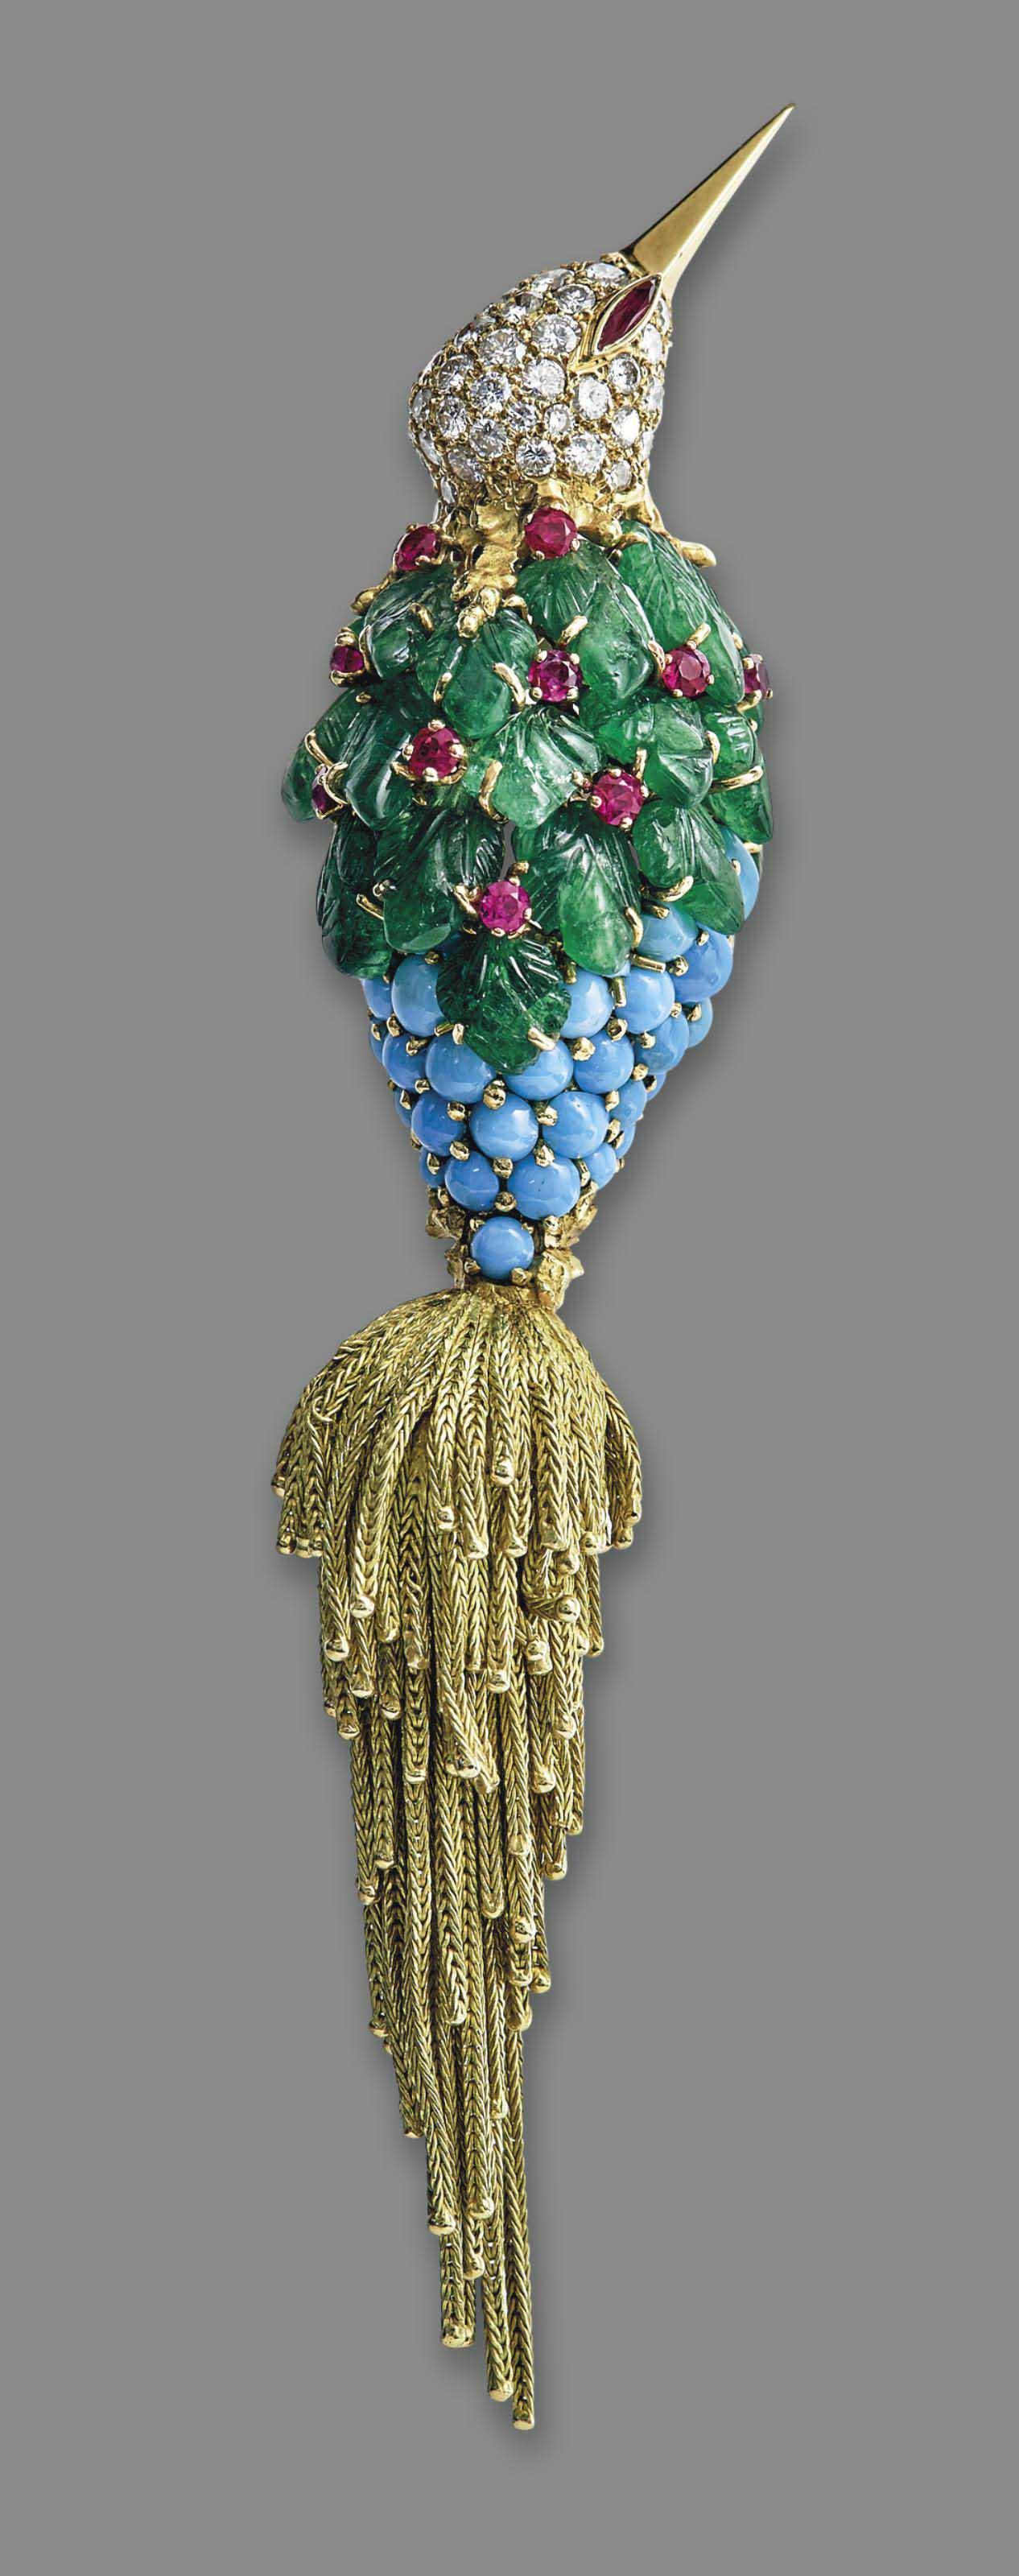 A MULTI-GEM, DIAMOND AND GOLD BIRD BROOCH, BY STERLÉ